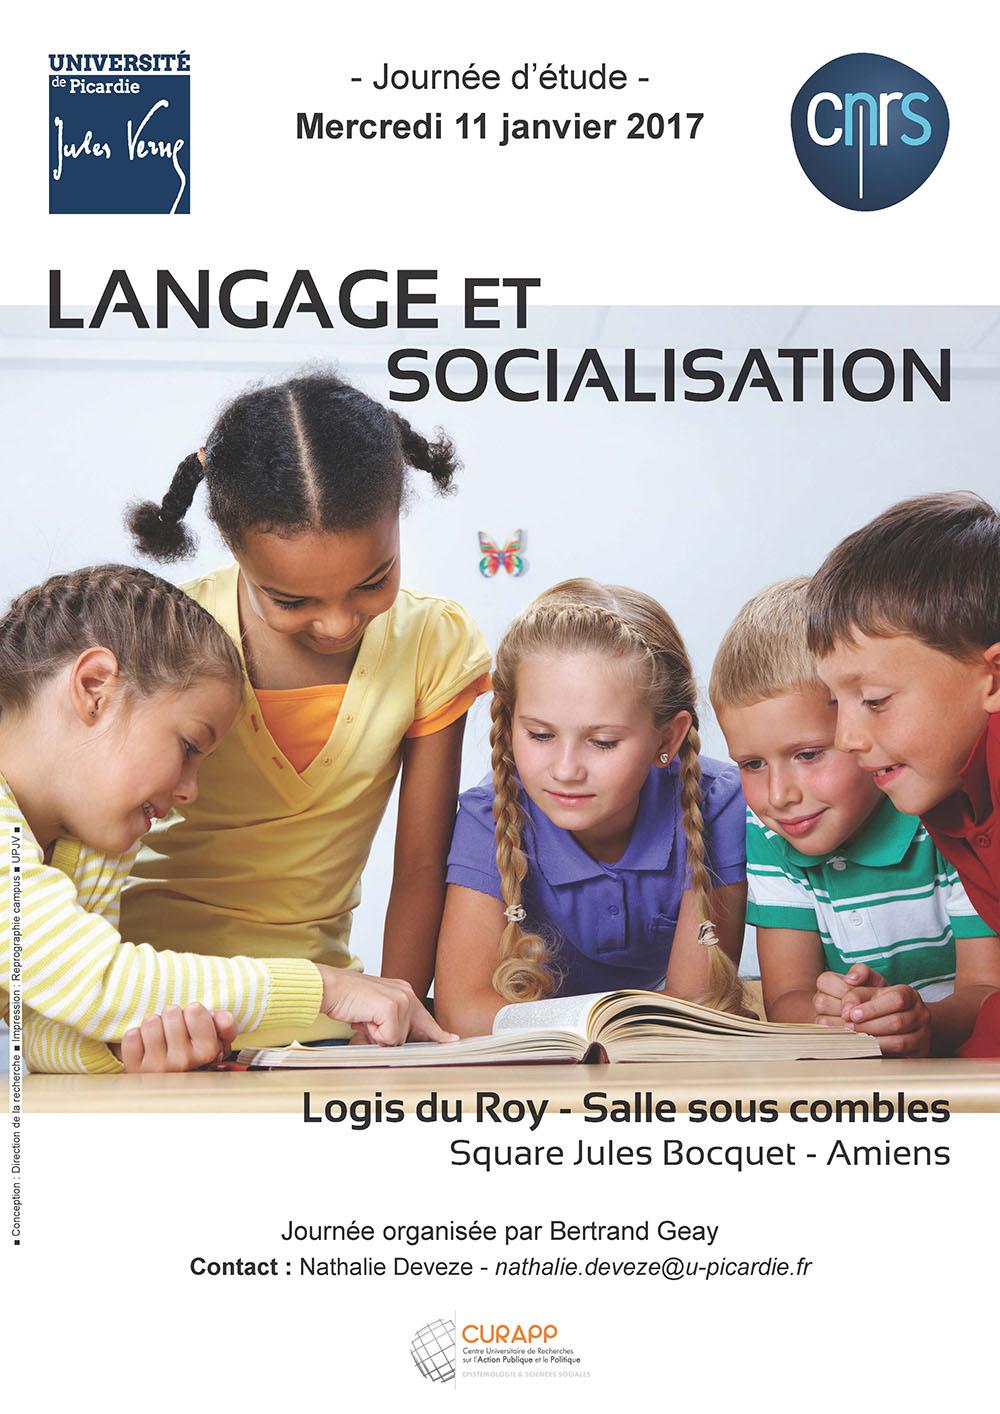 Langage et socialisation